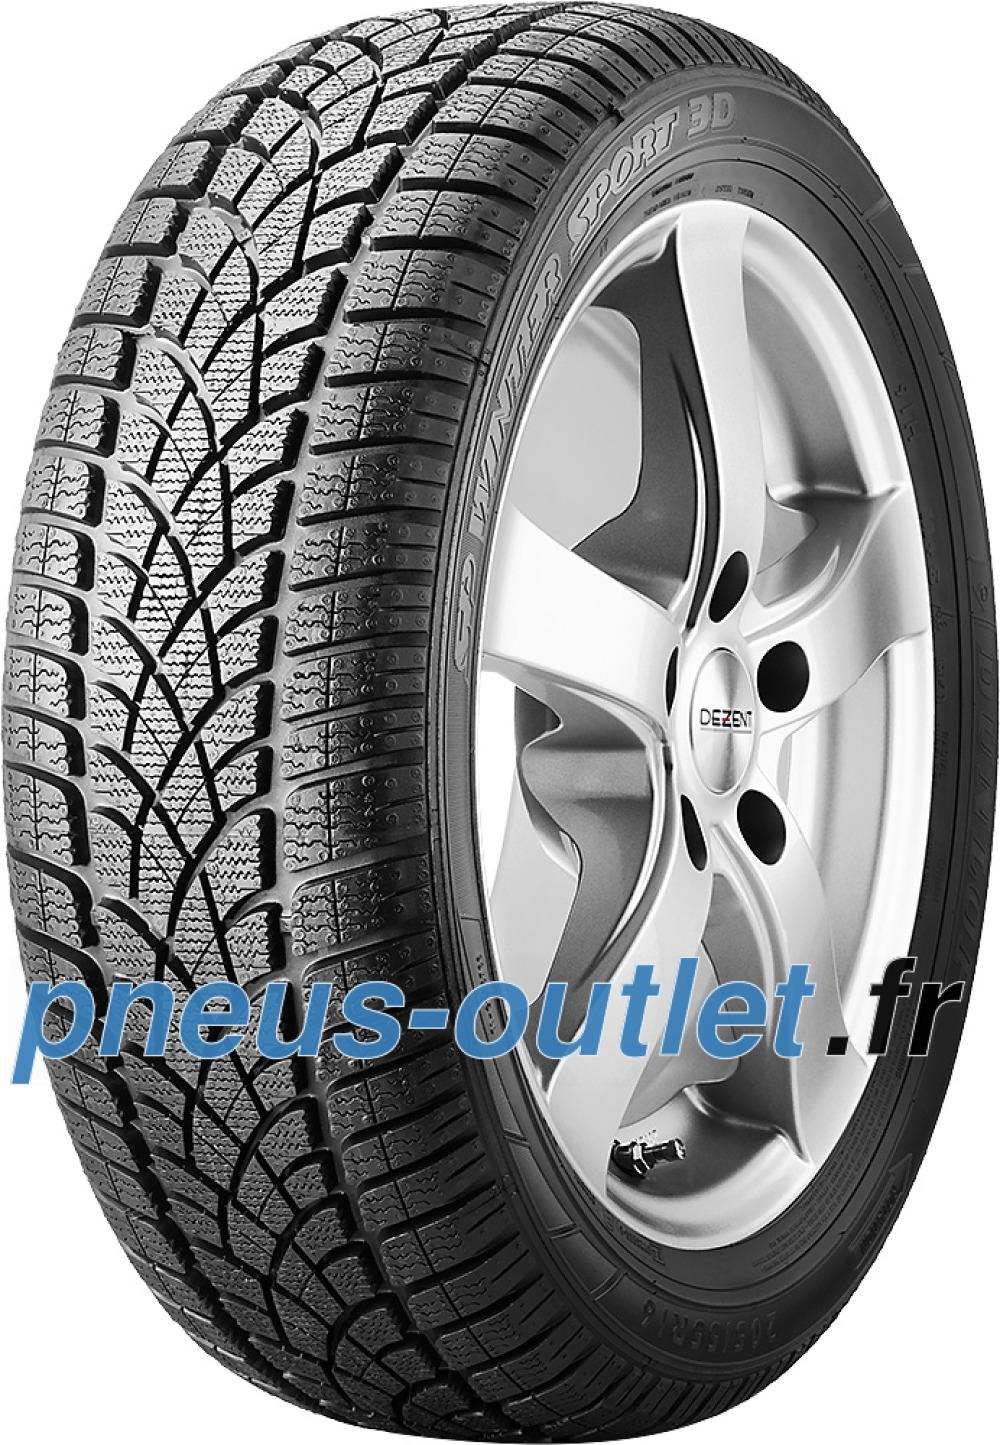 Dunlop SP Winter Sport 3D ( 235/40 R19 96V XL , RO1, avec protège-jante (MFS) BLT )